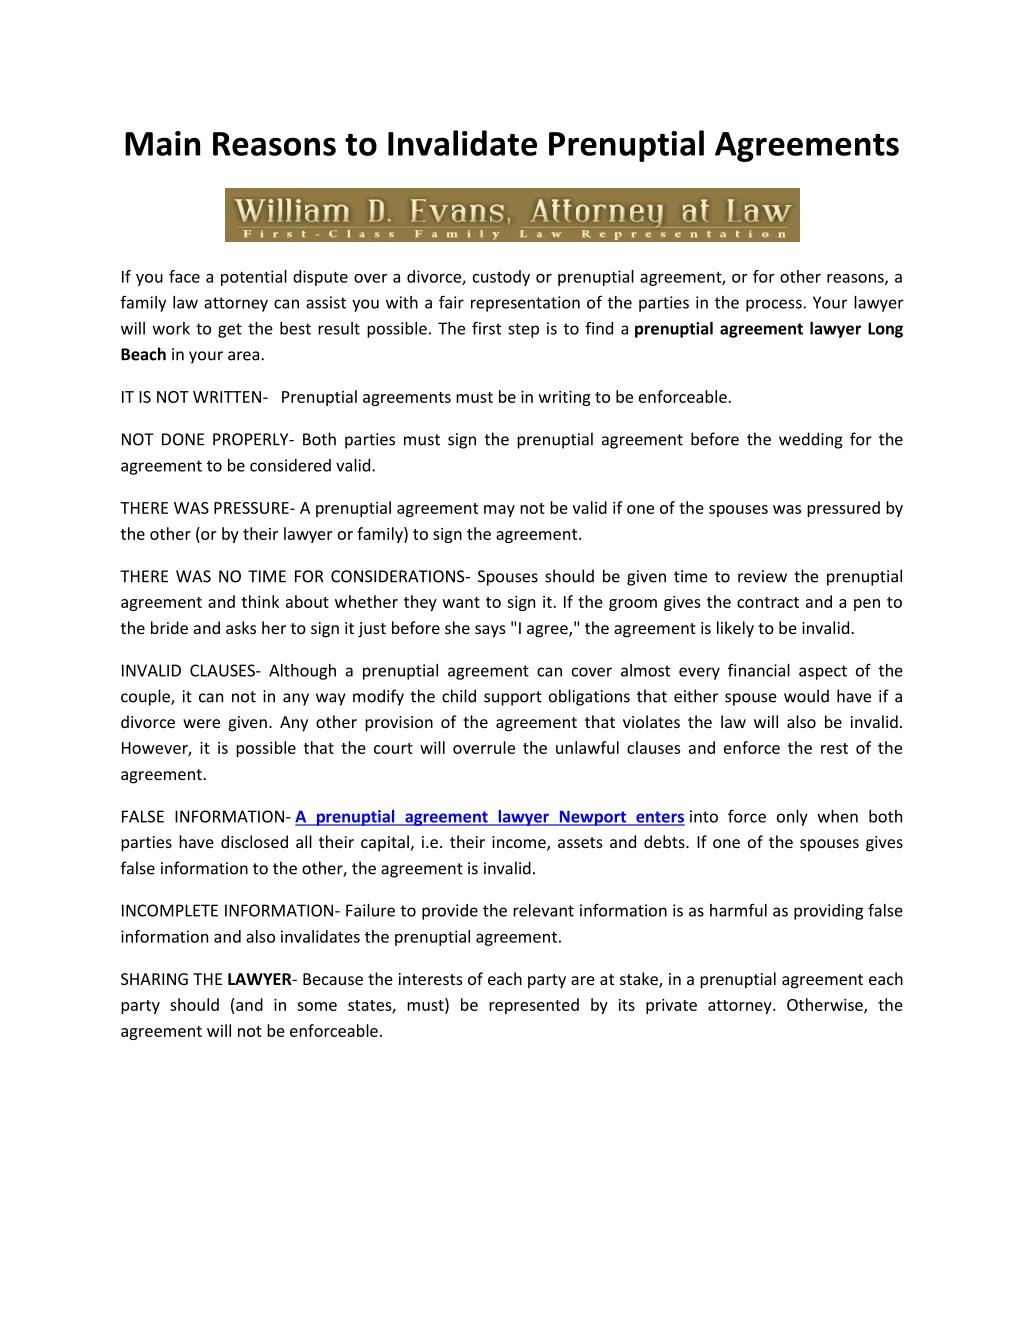 How to Modify a Prenuptial Agreement